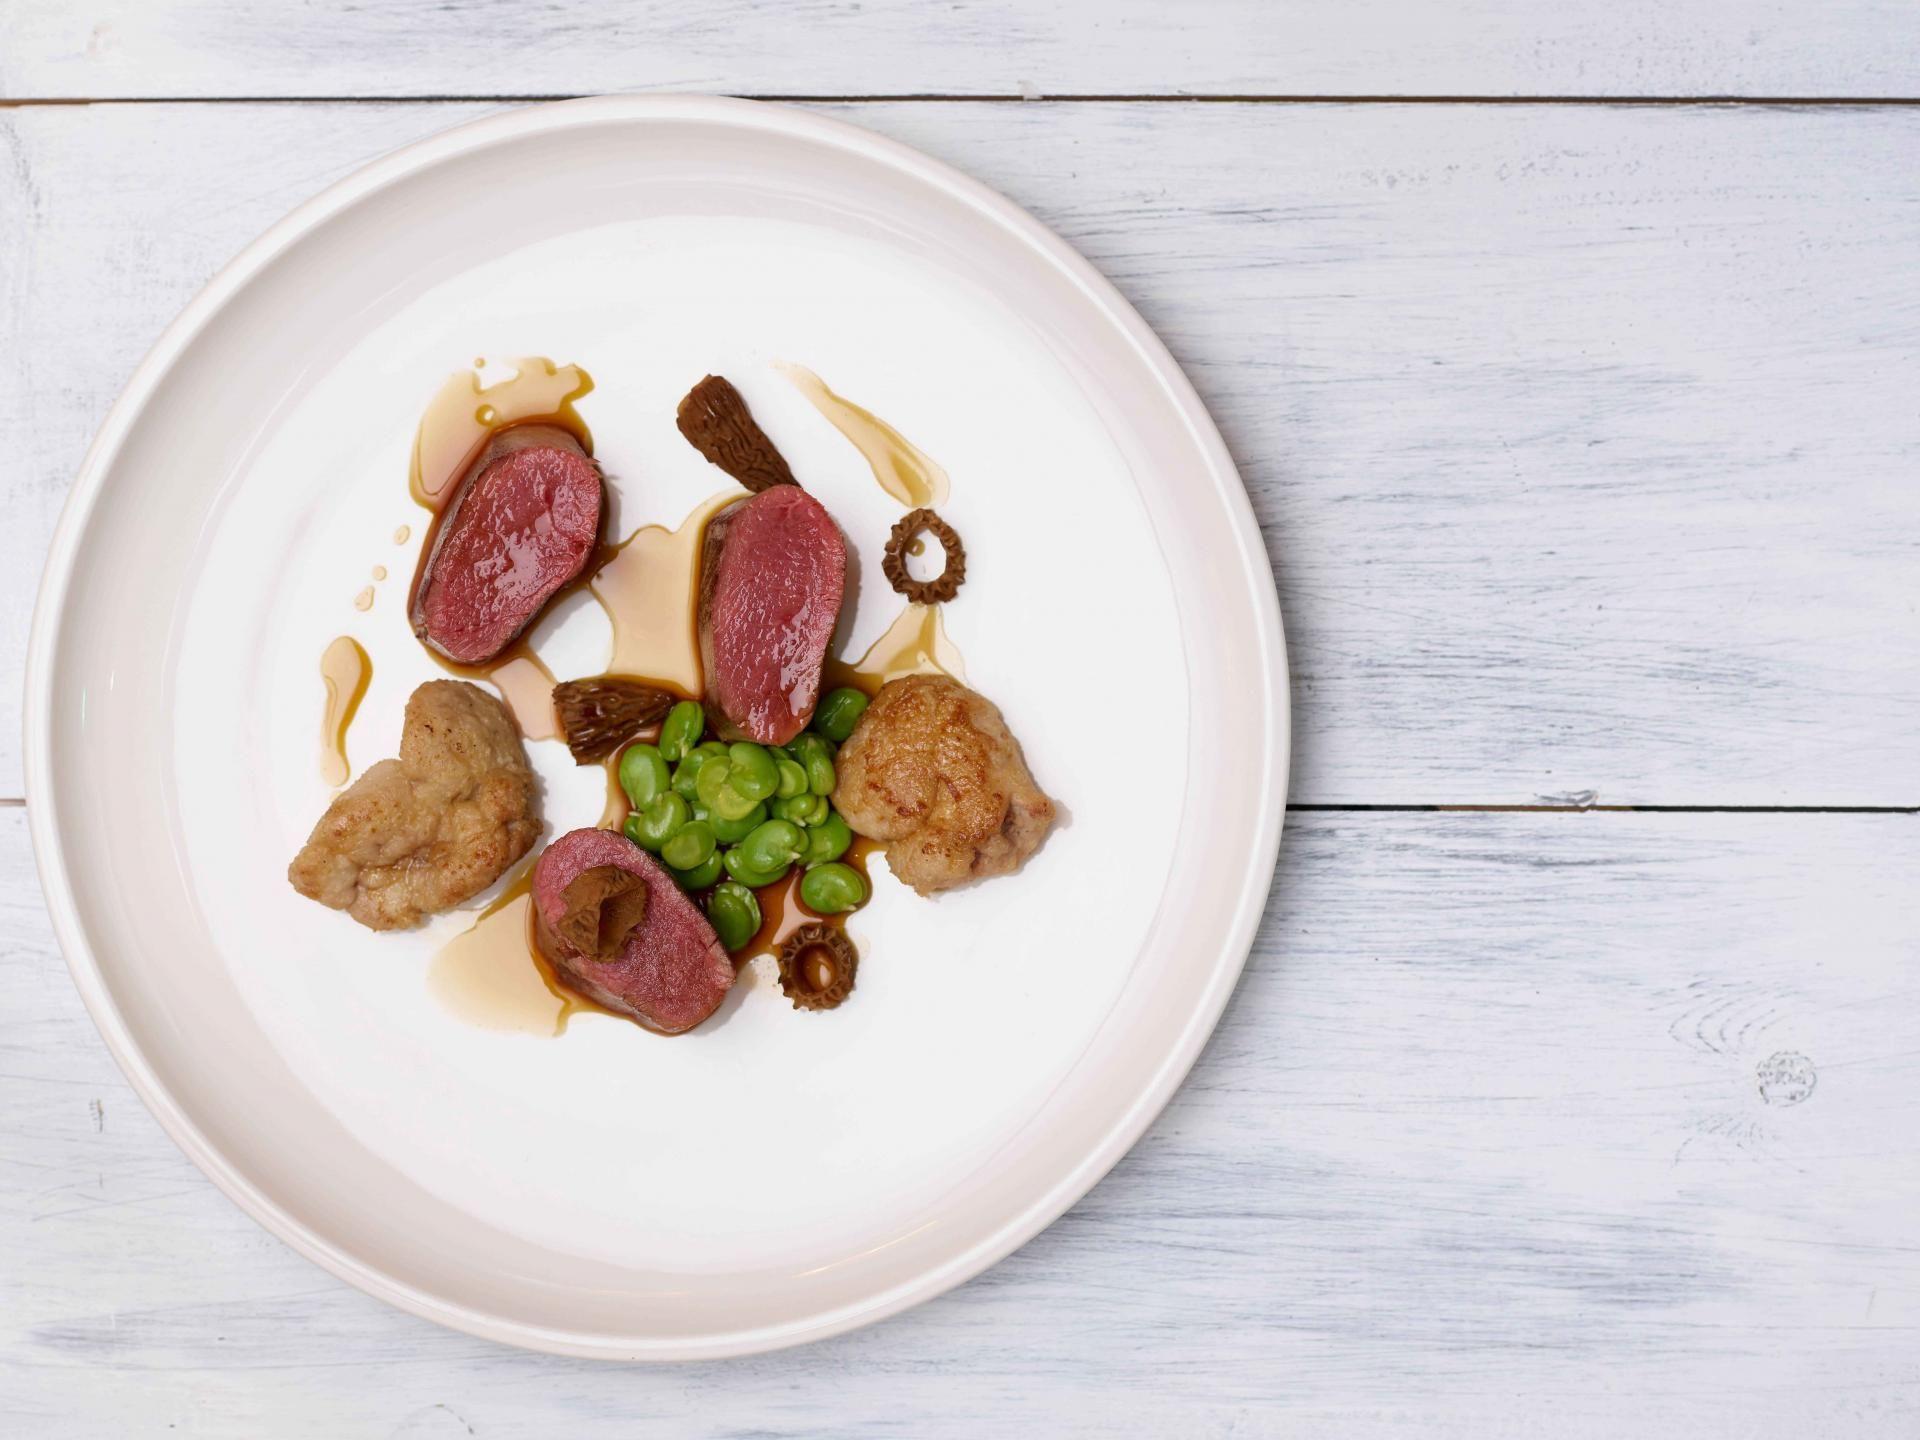 Hans bar grill chelsea restaurant review food dog